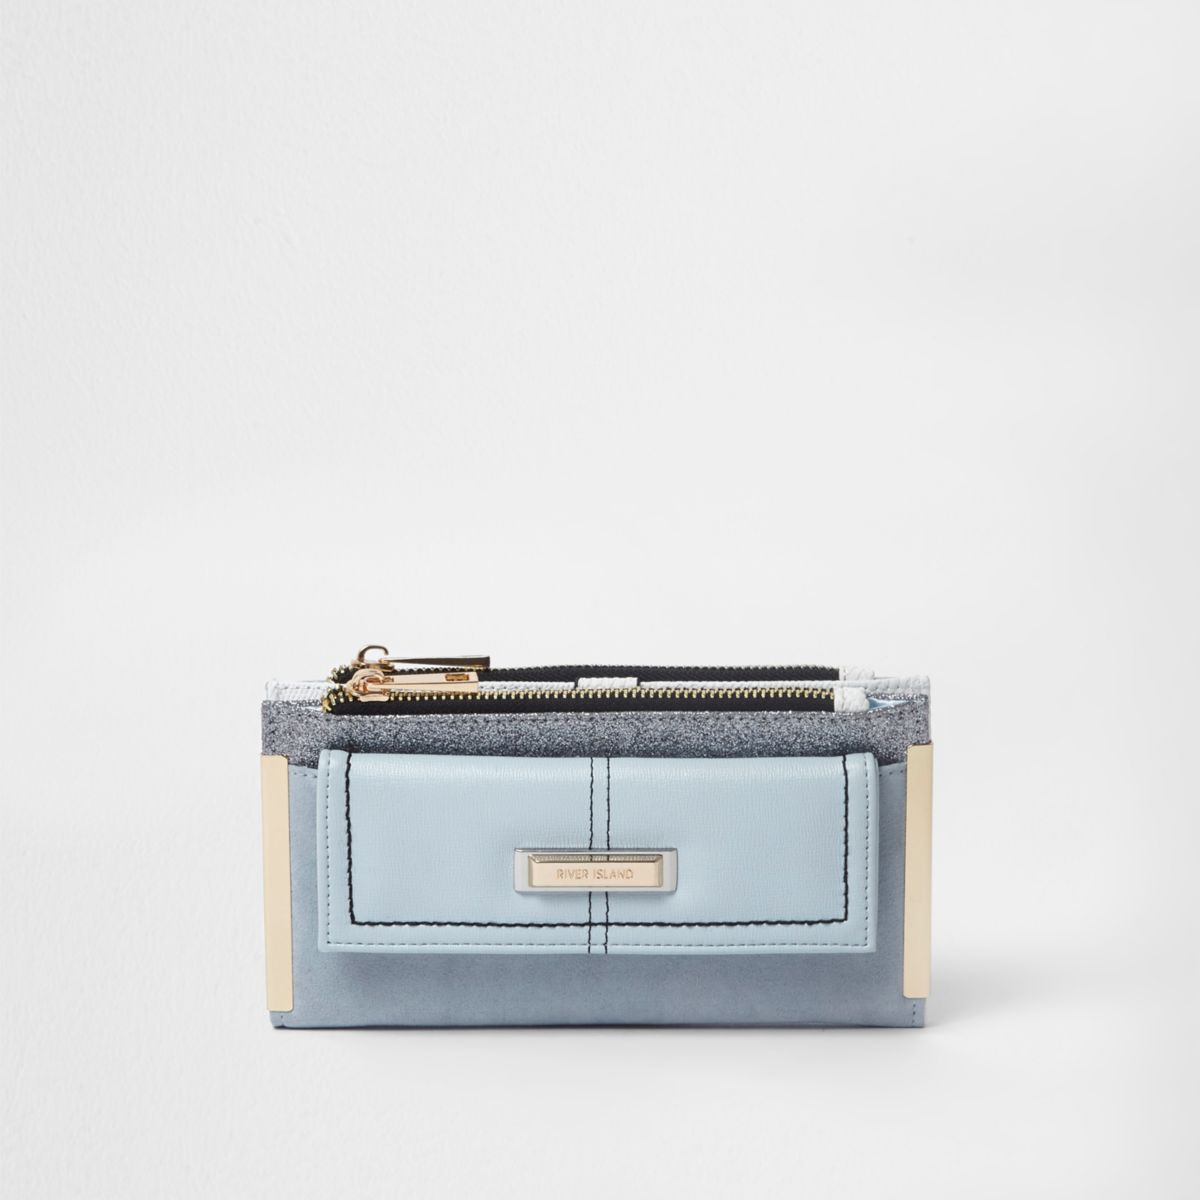 Blauwe uitvouwbare portemonnee met glitters en vakje